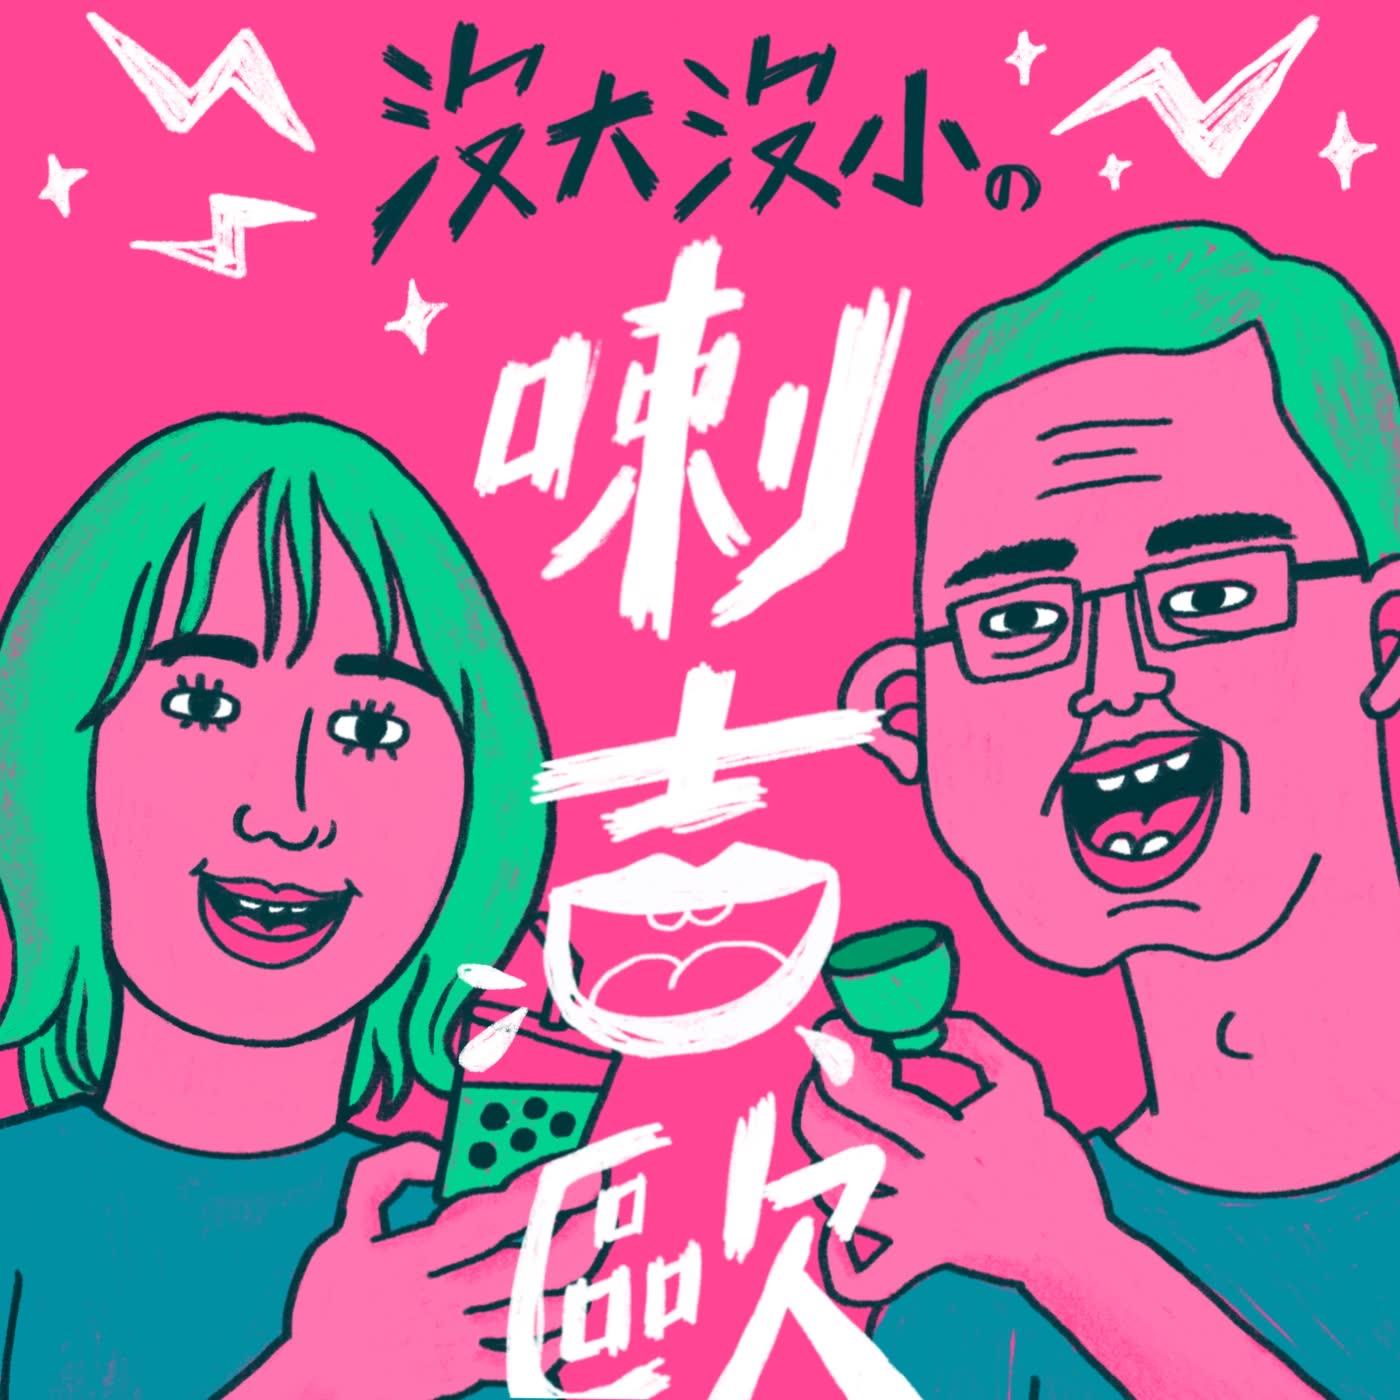 EP14 從扛家計到周遊列國 打工度假開啟新人生 feat.凱西女孩